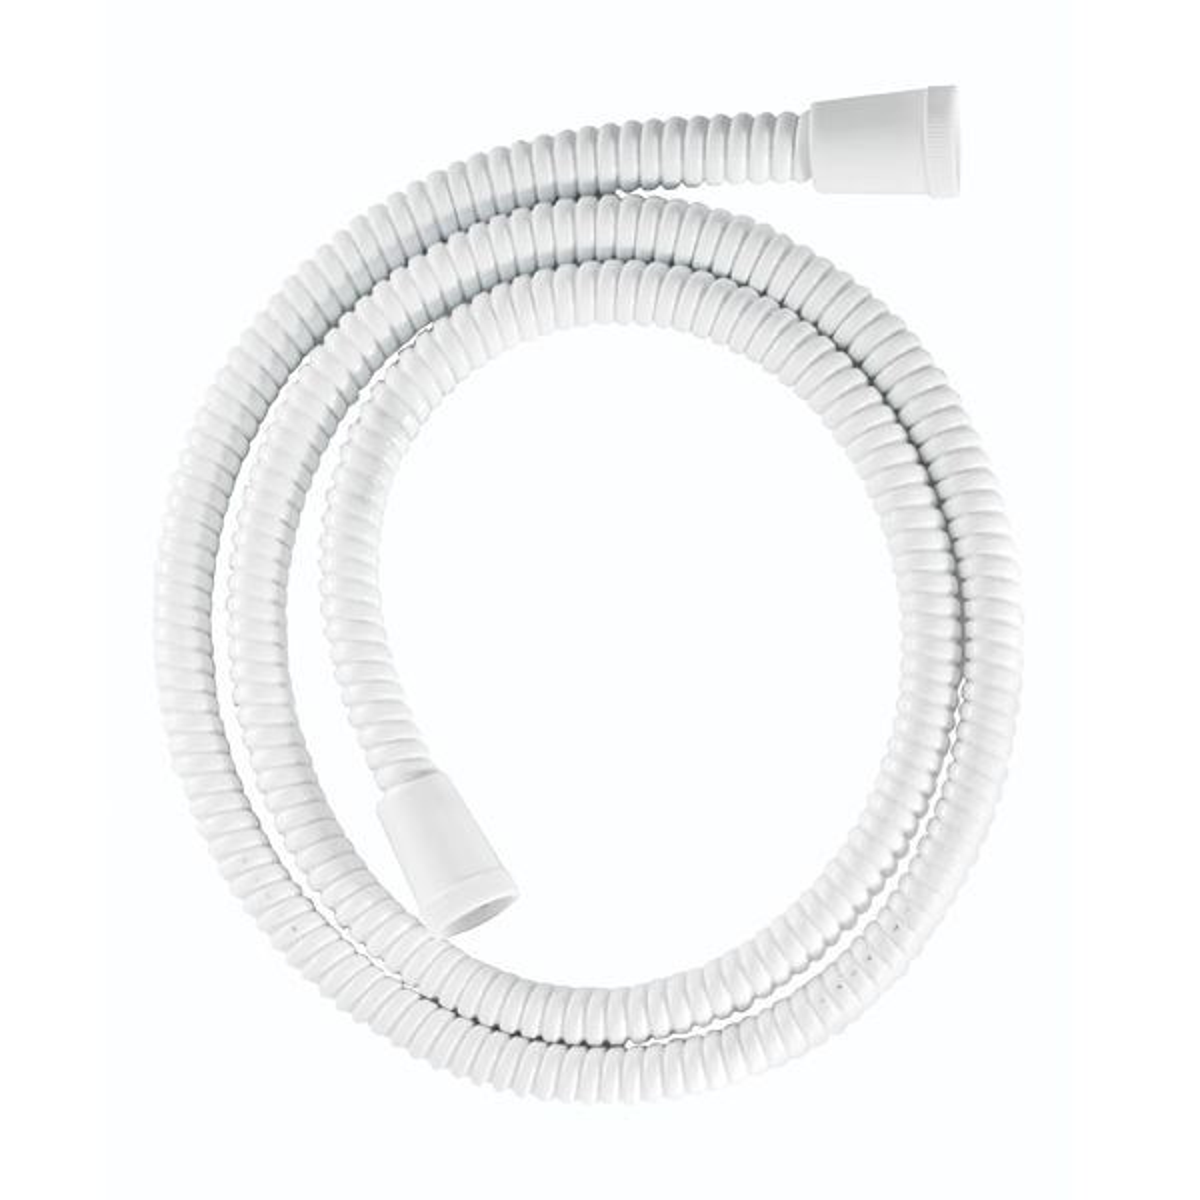 Croydex White PVC Reinforced Shower Hose 1250mm